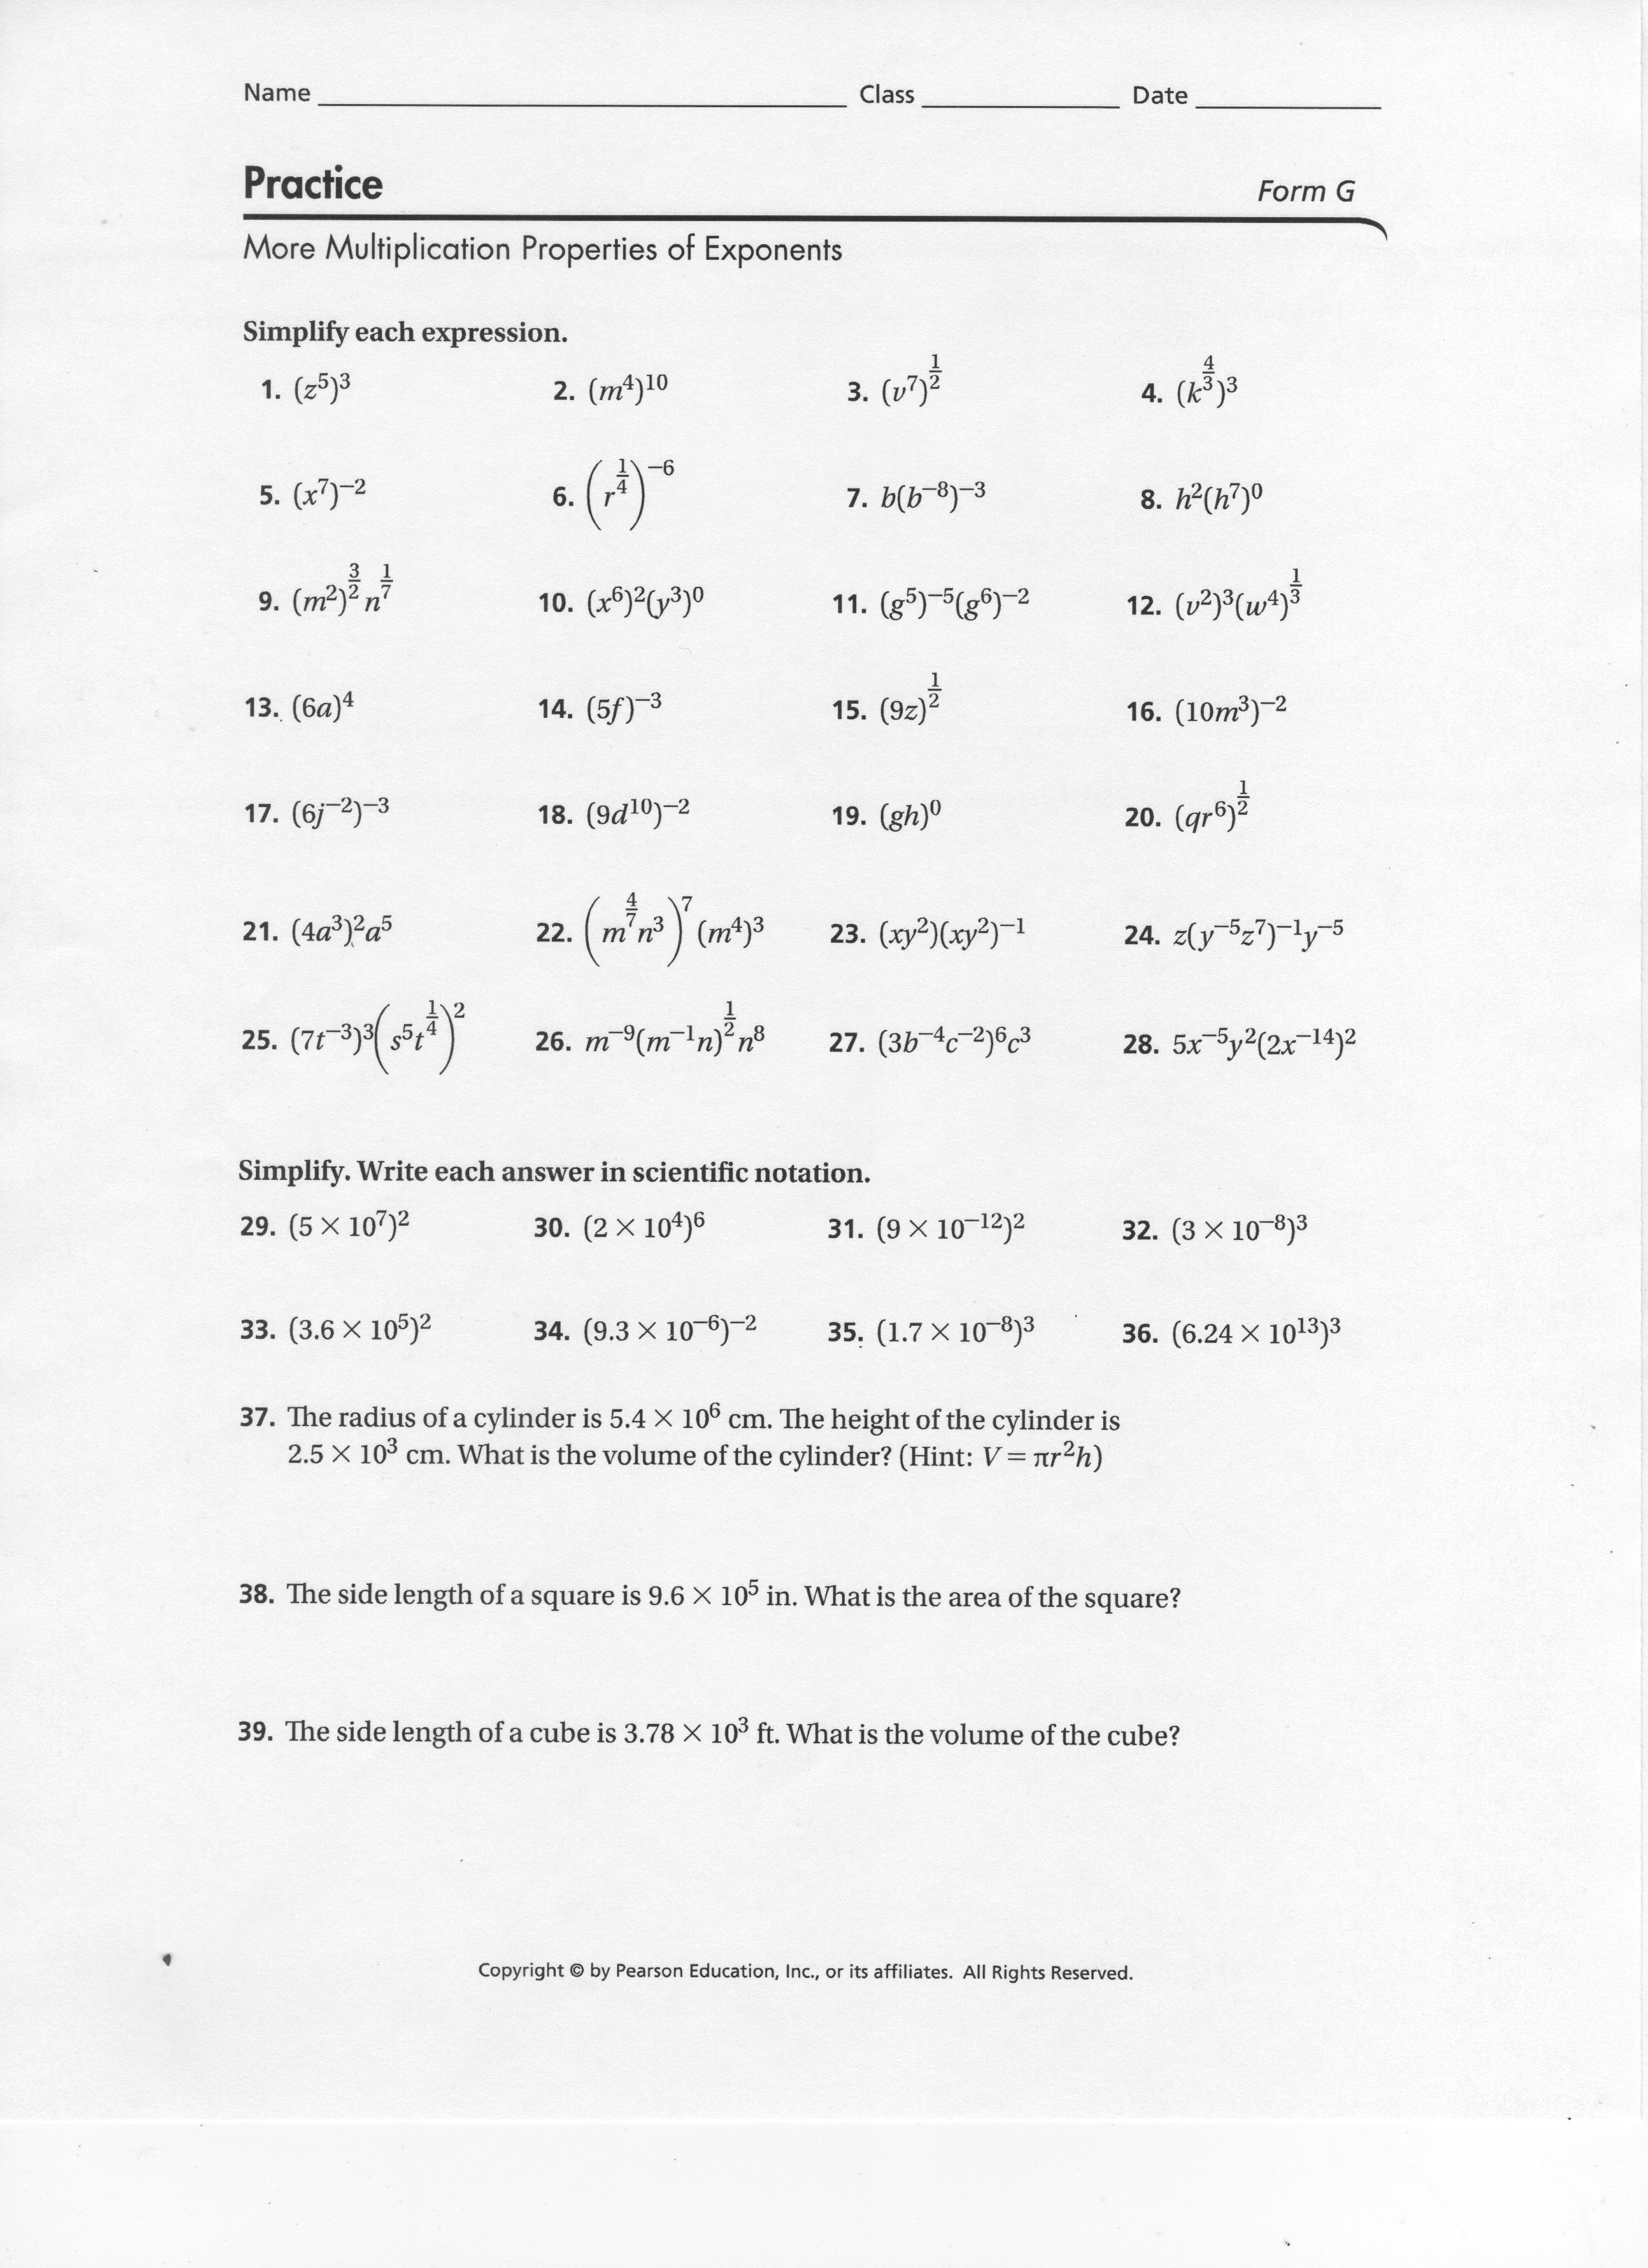 Worksheet Multiplication Properties Of Exponents